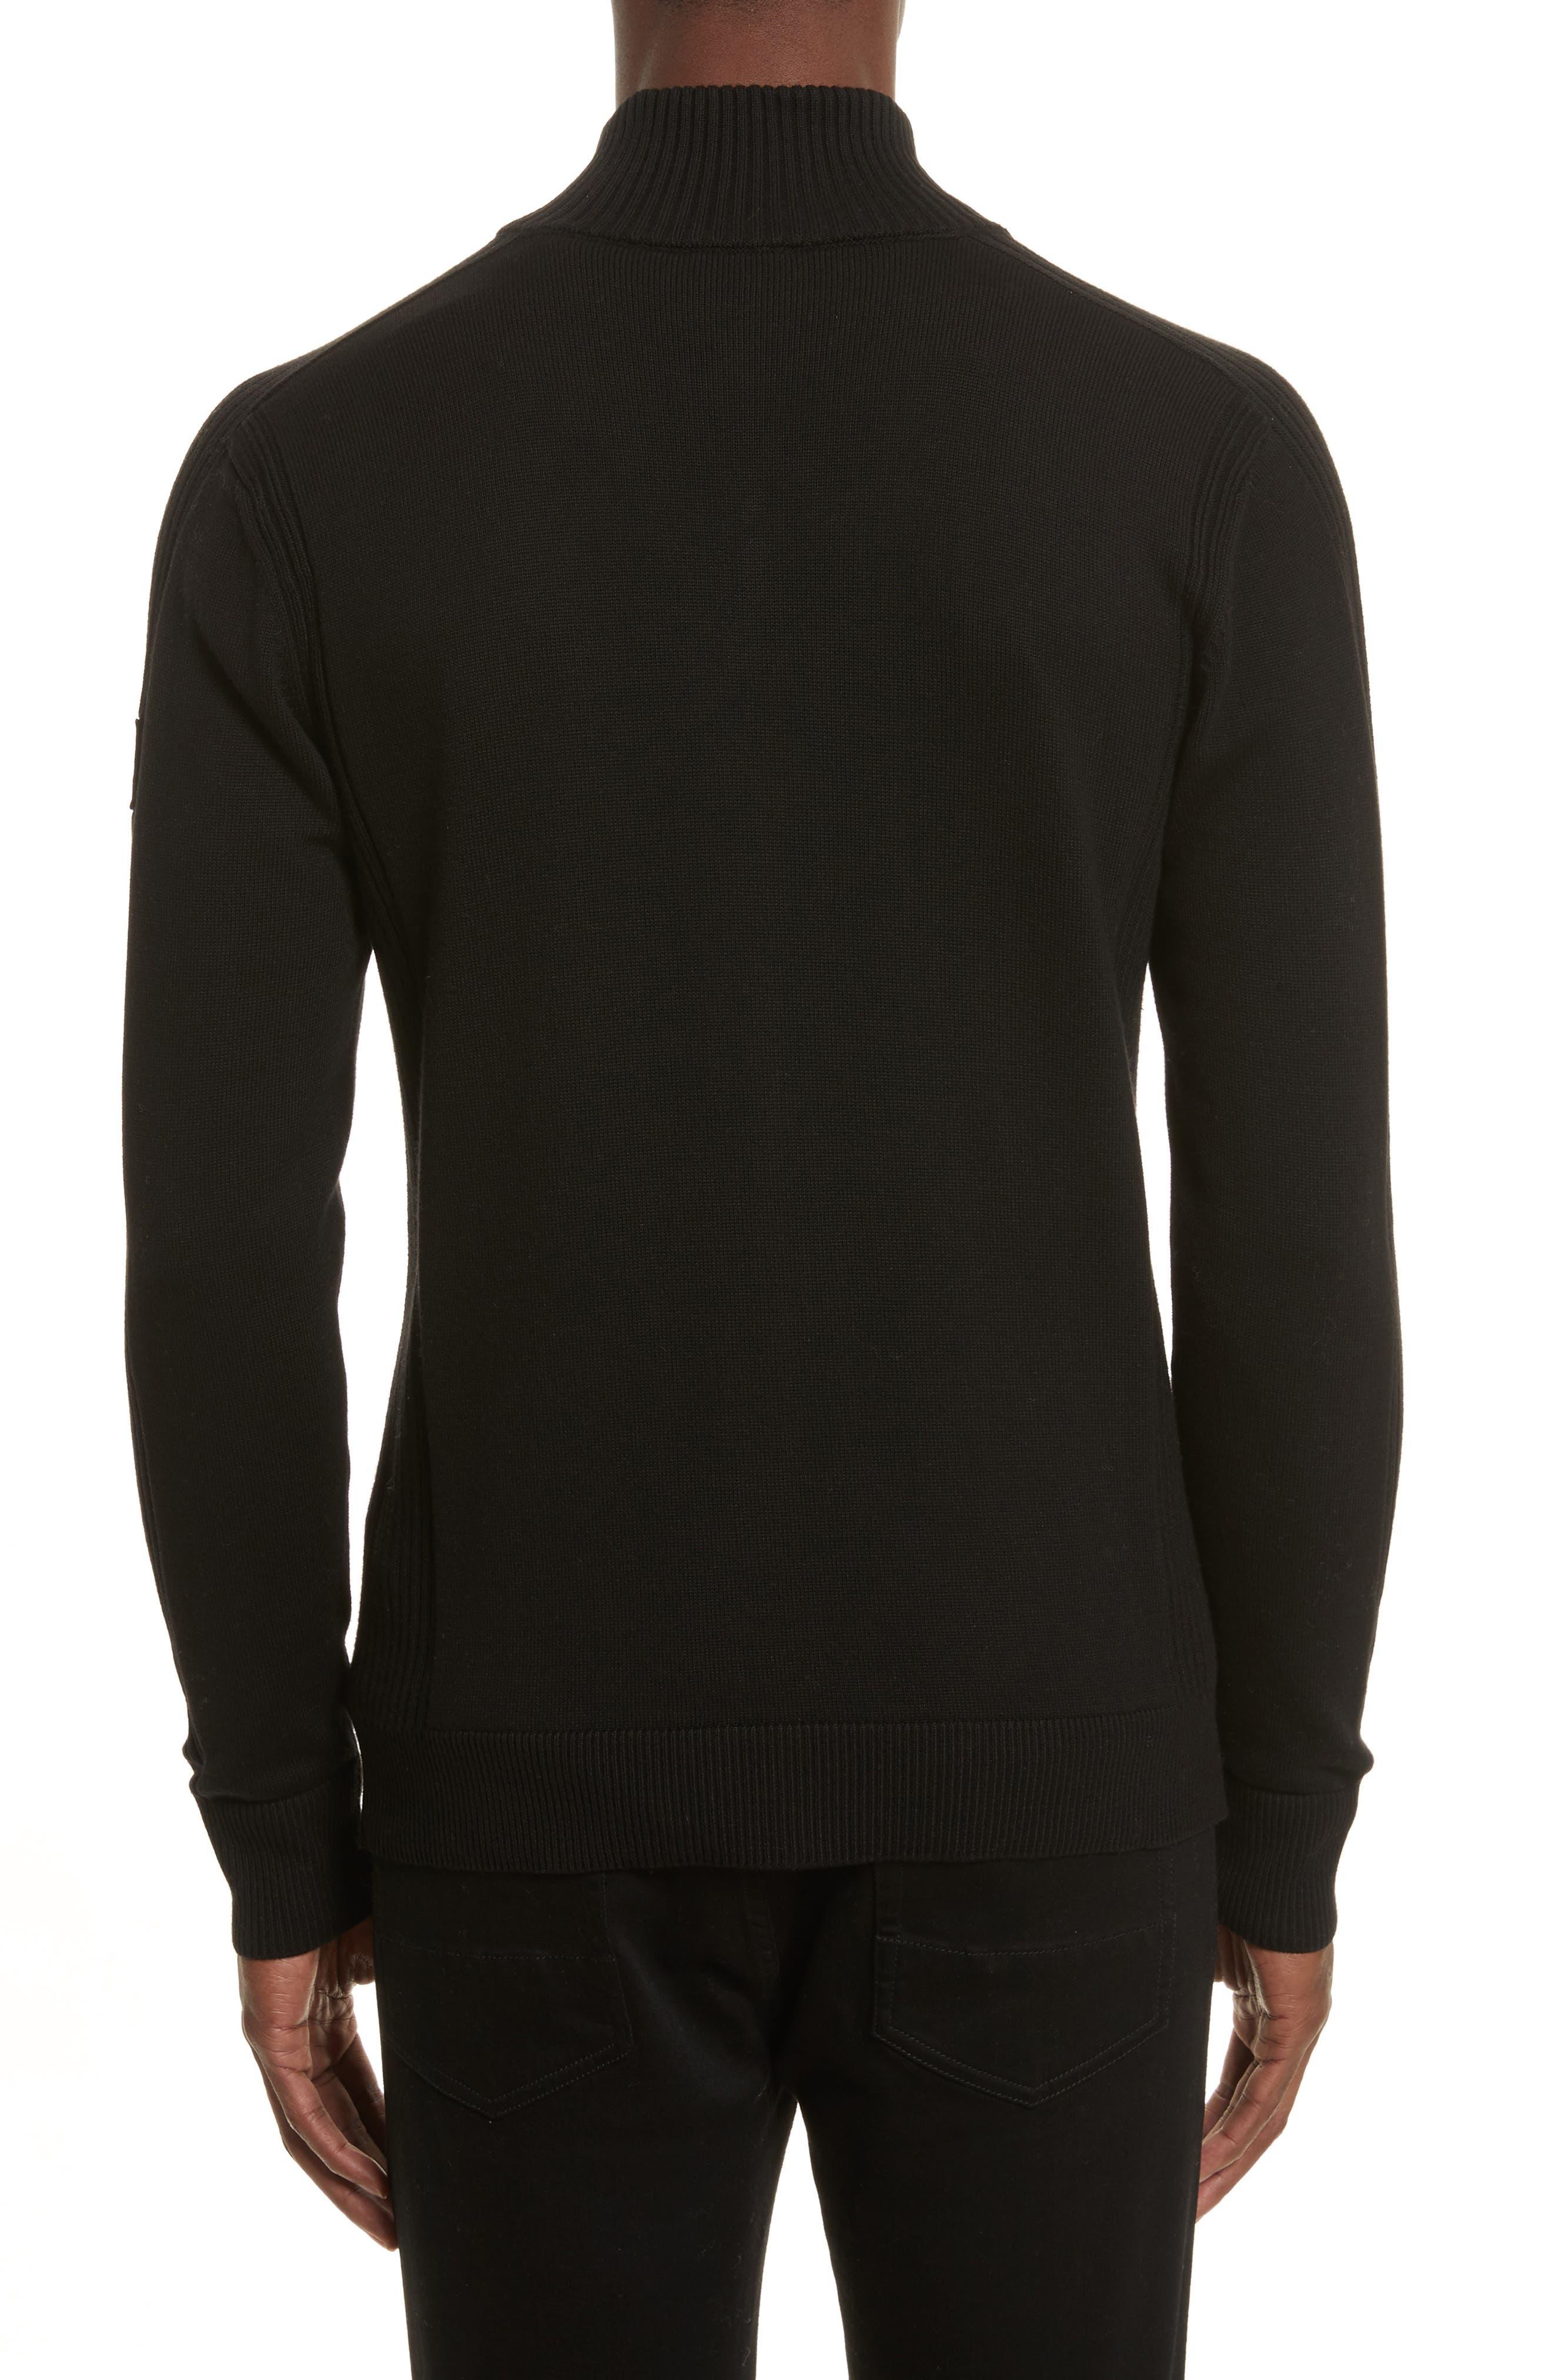 Allerford Knit Cotton Jacket,                             Alternate thumbnail 2, color,                             Black